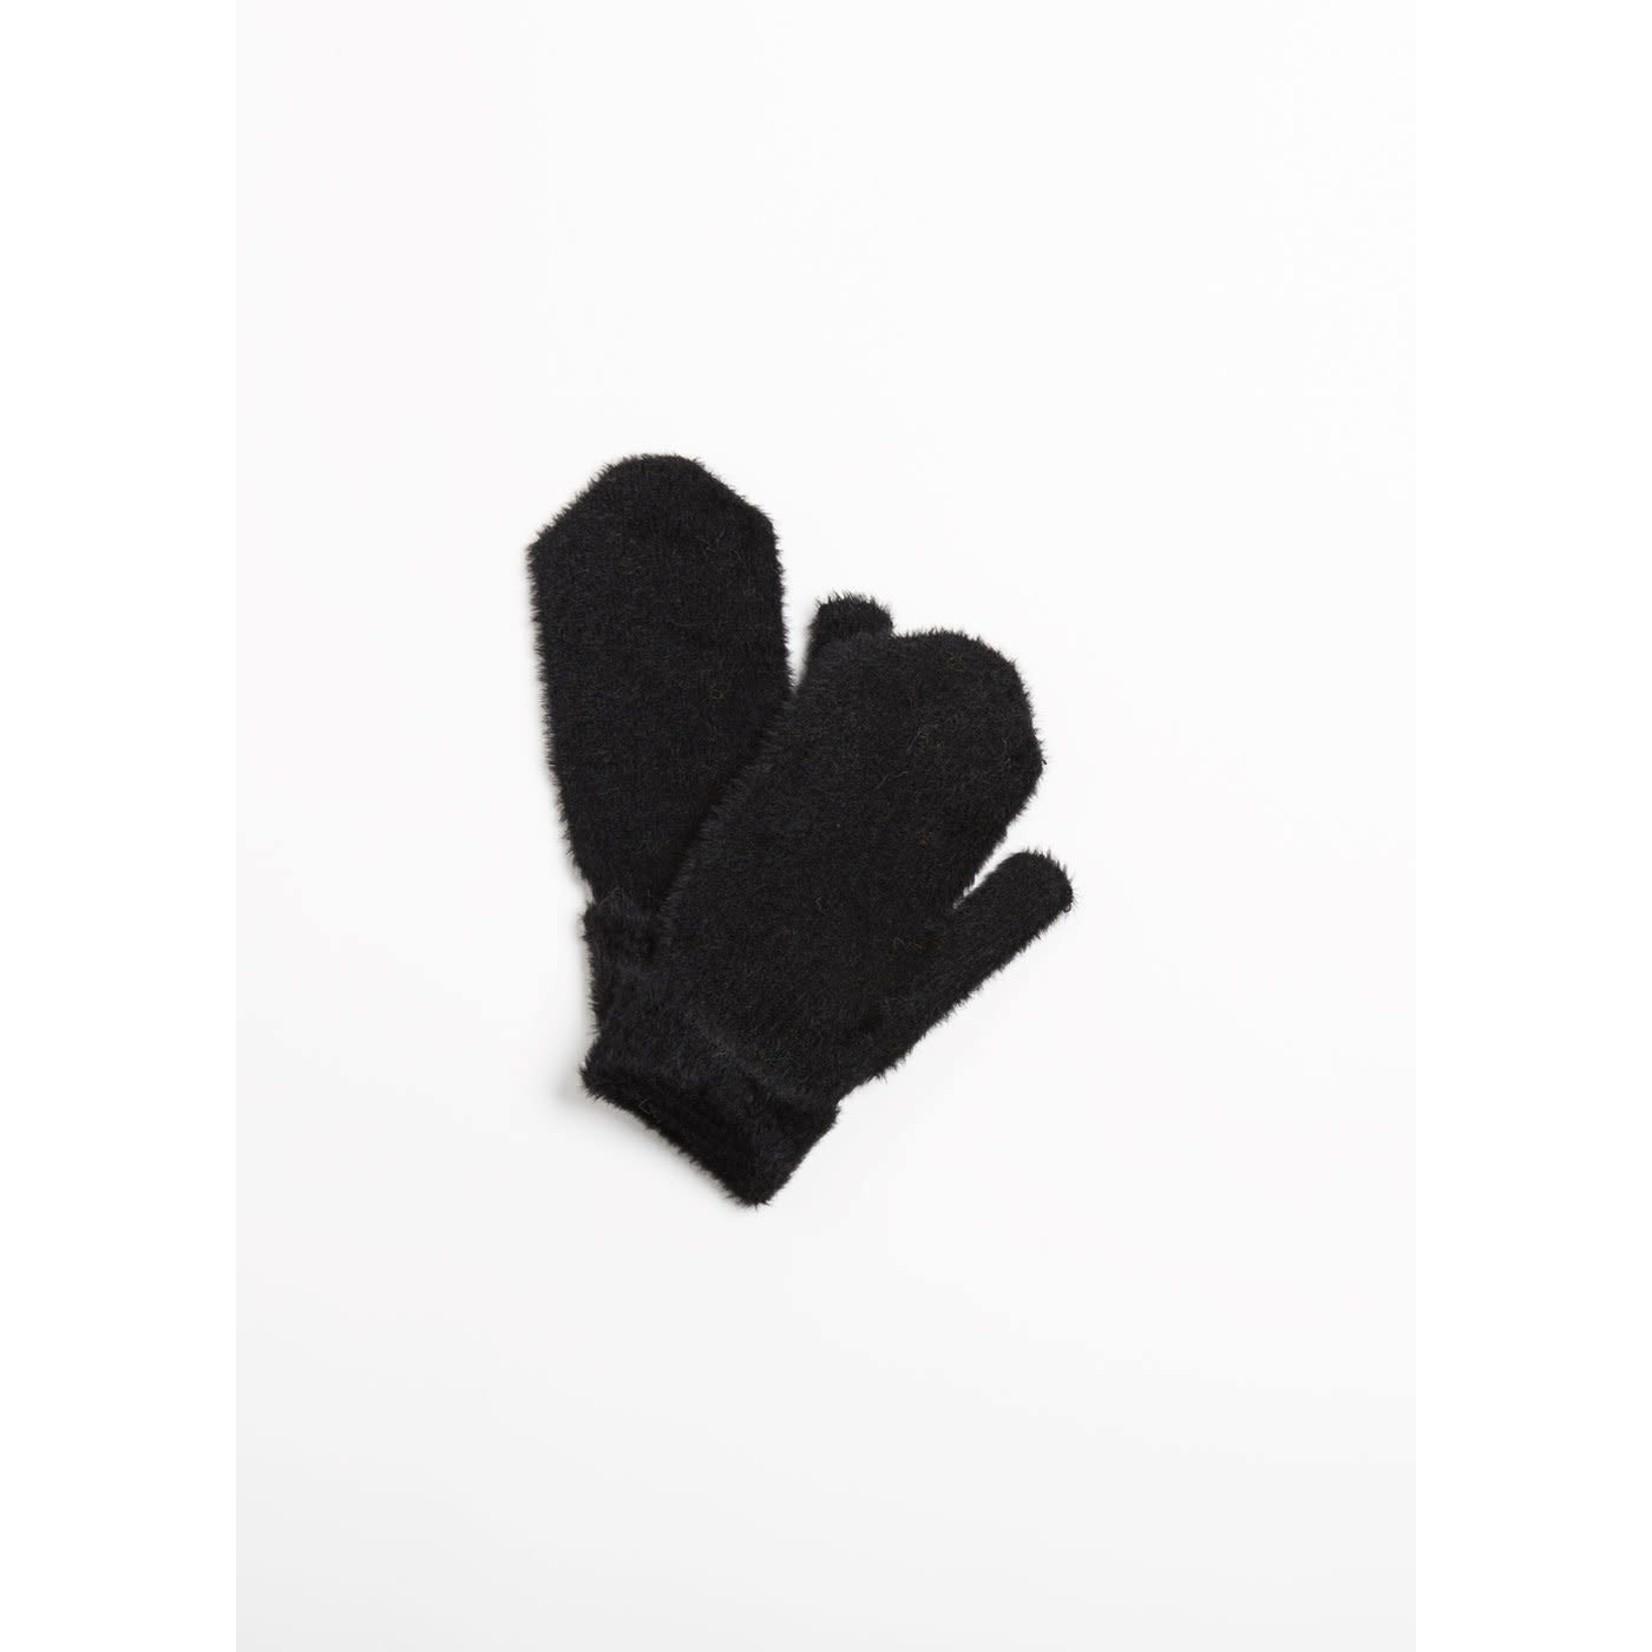 Angora Basic Mittens in Black